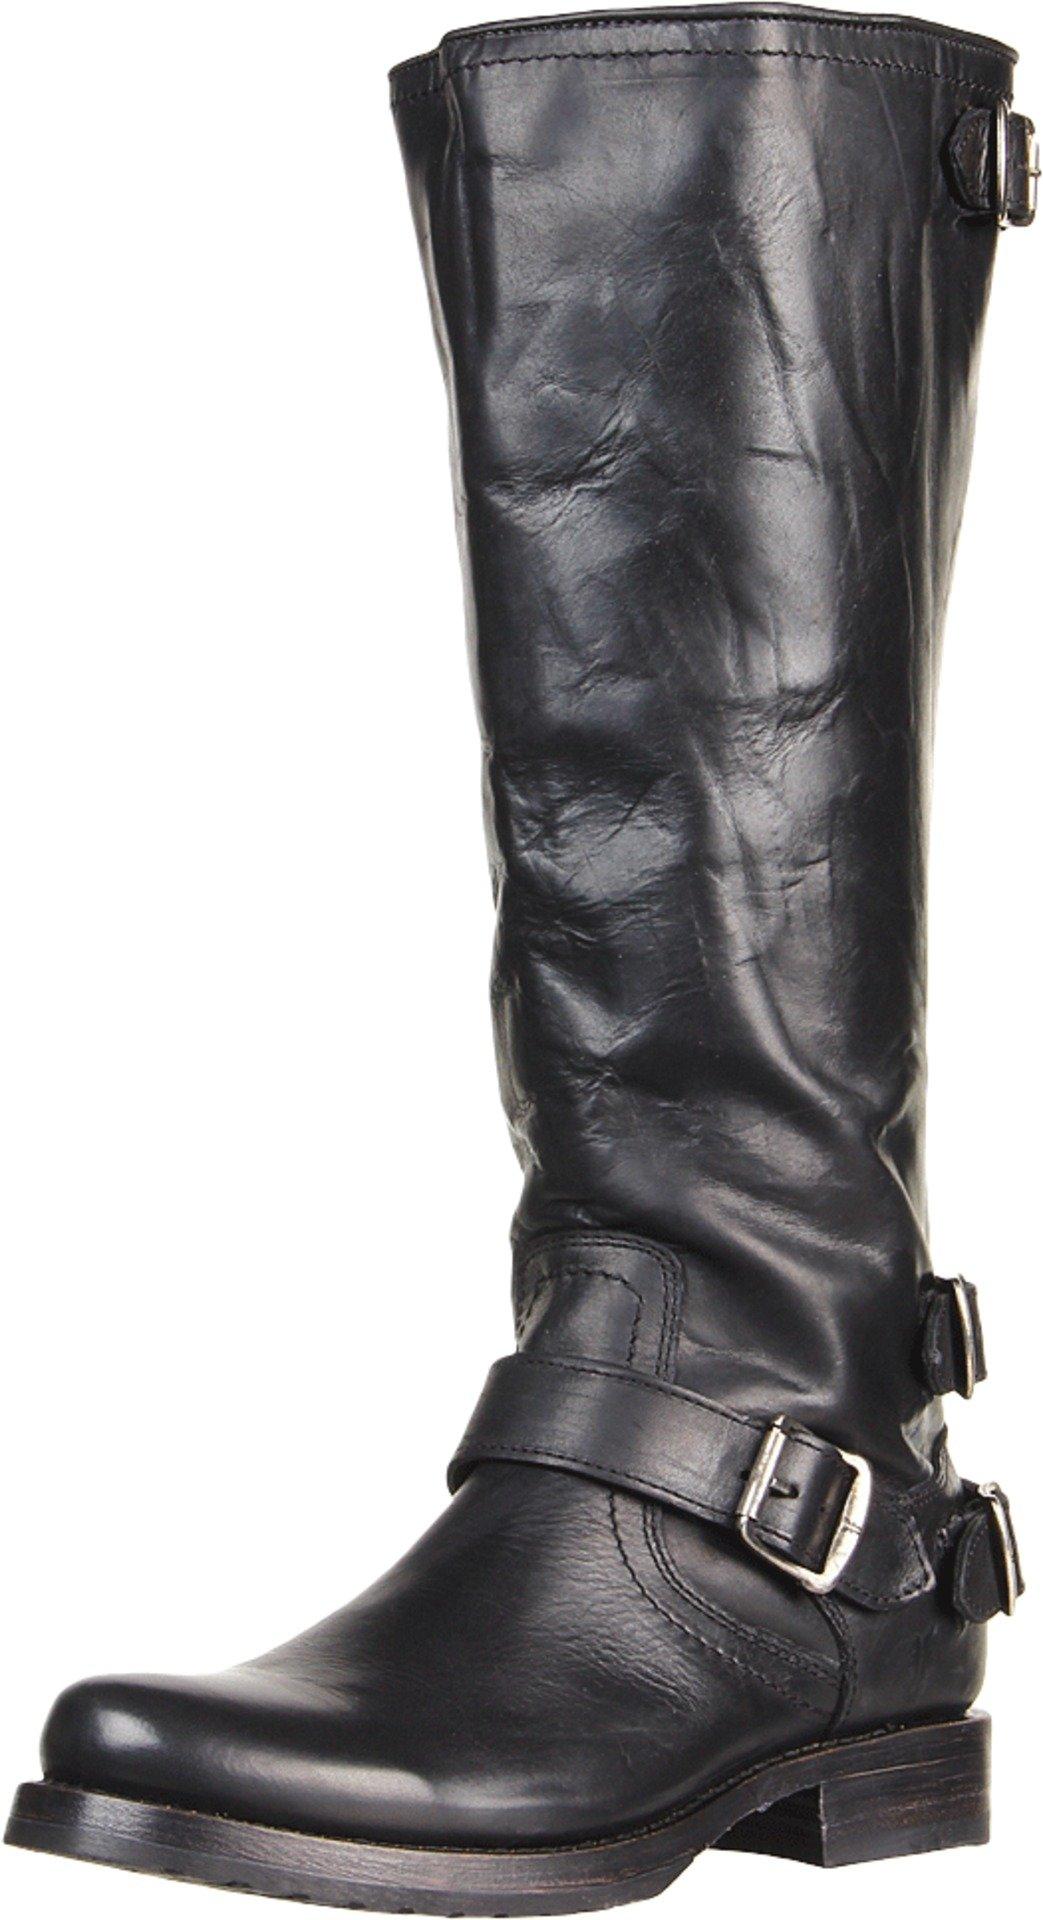 FRYE Women's Veronica Back-Zip Boot, Black Soft Vintage Leather, 7 M US